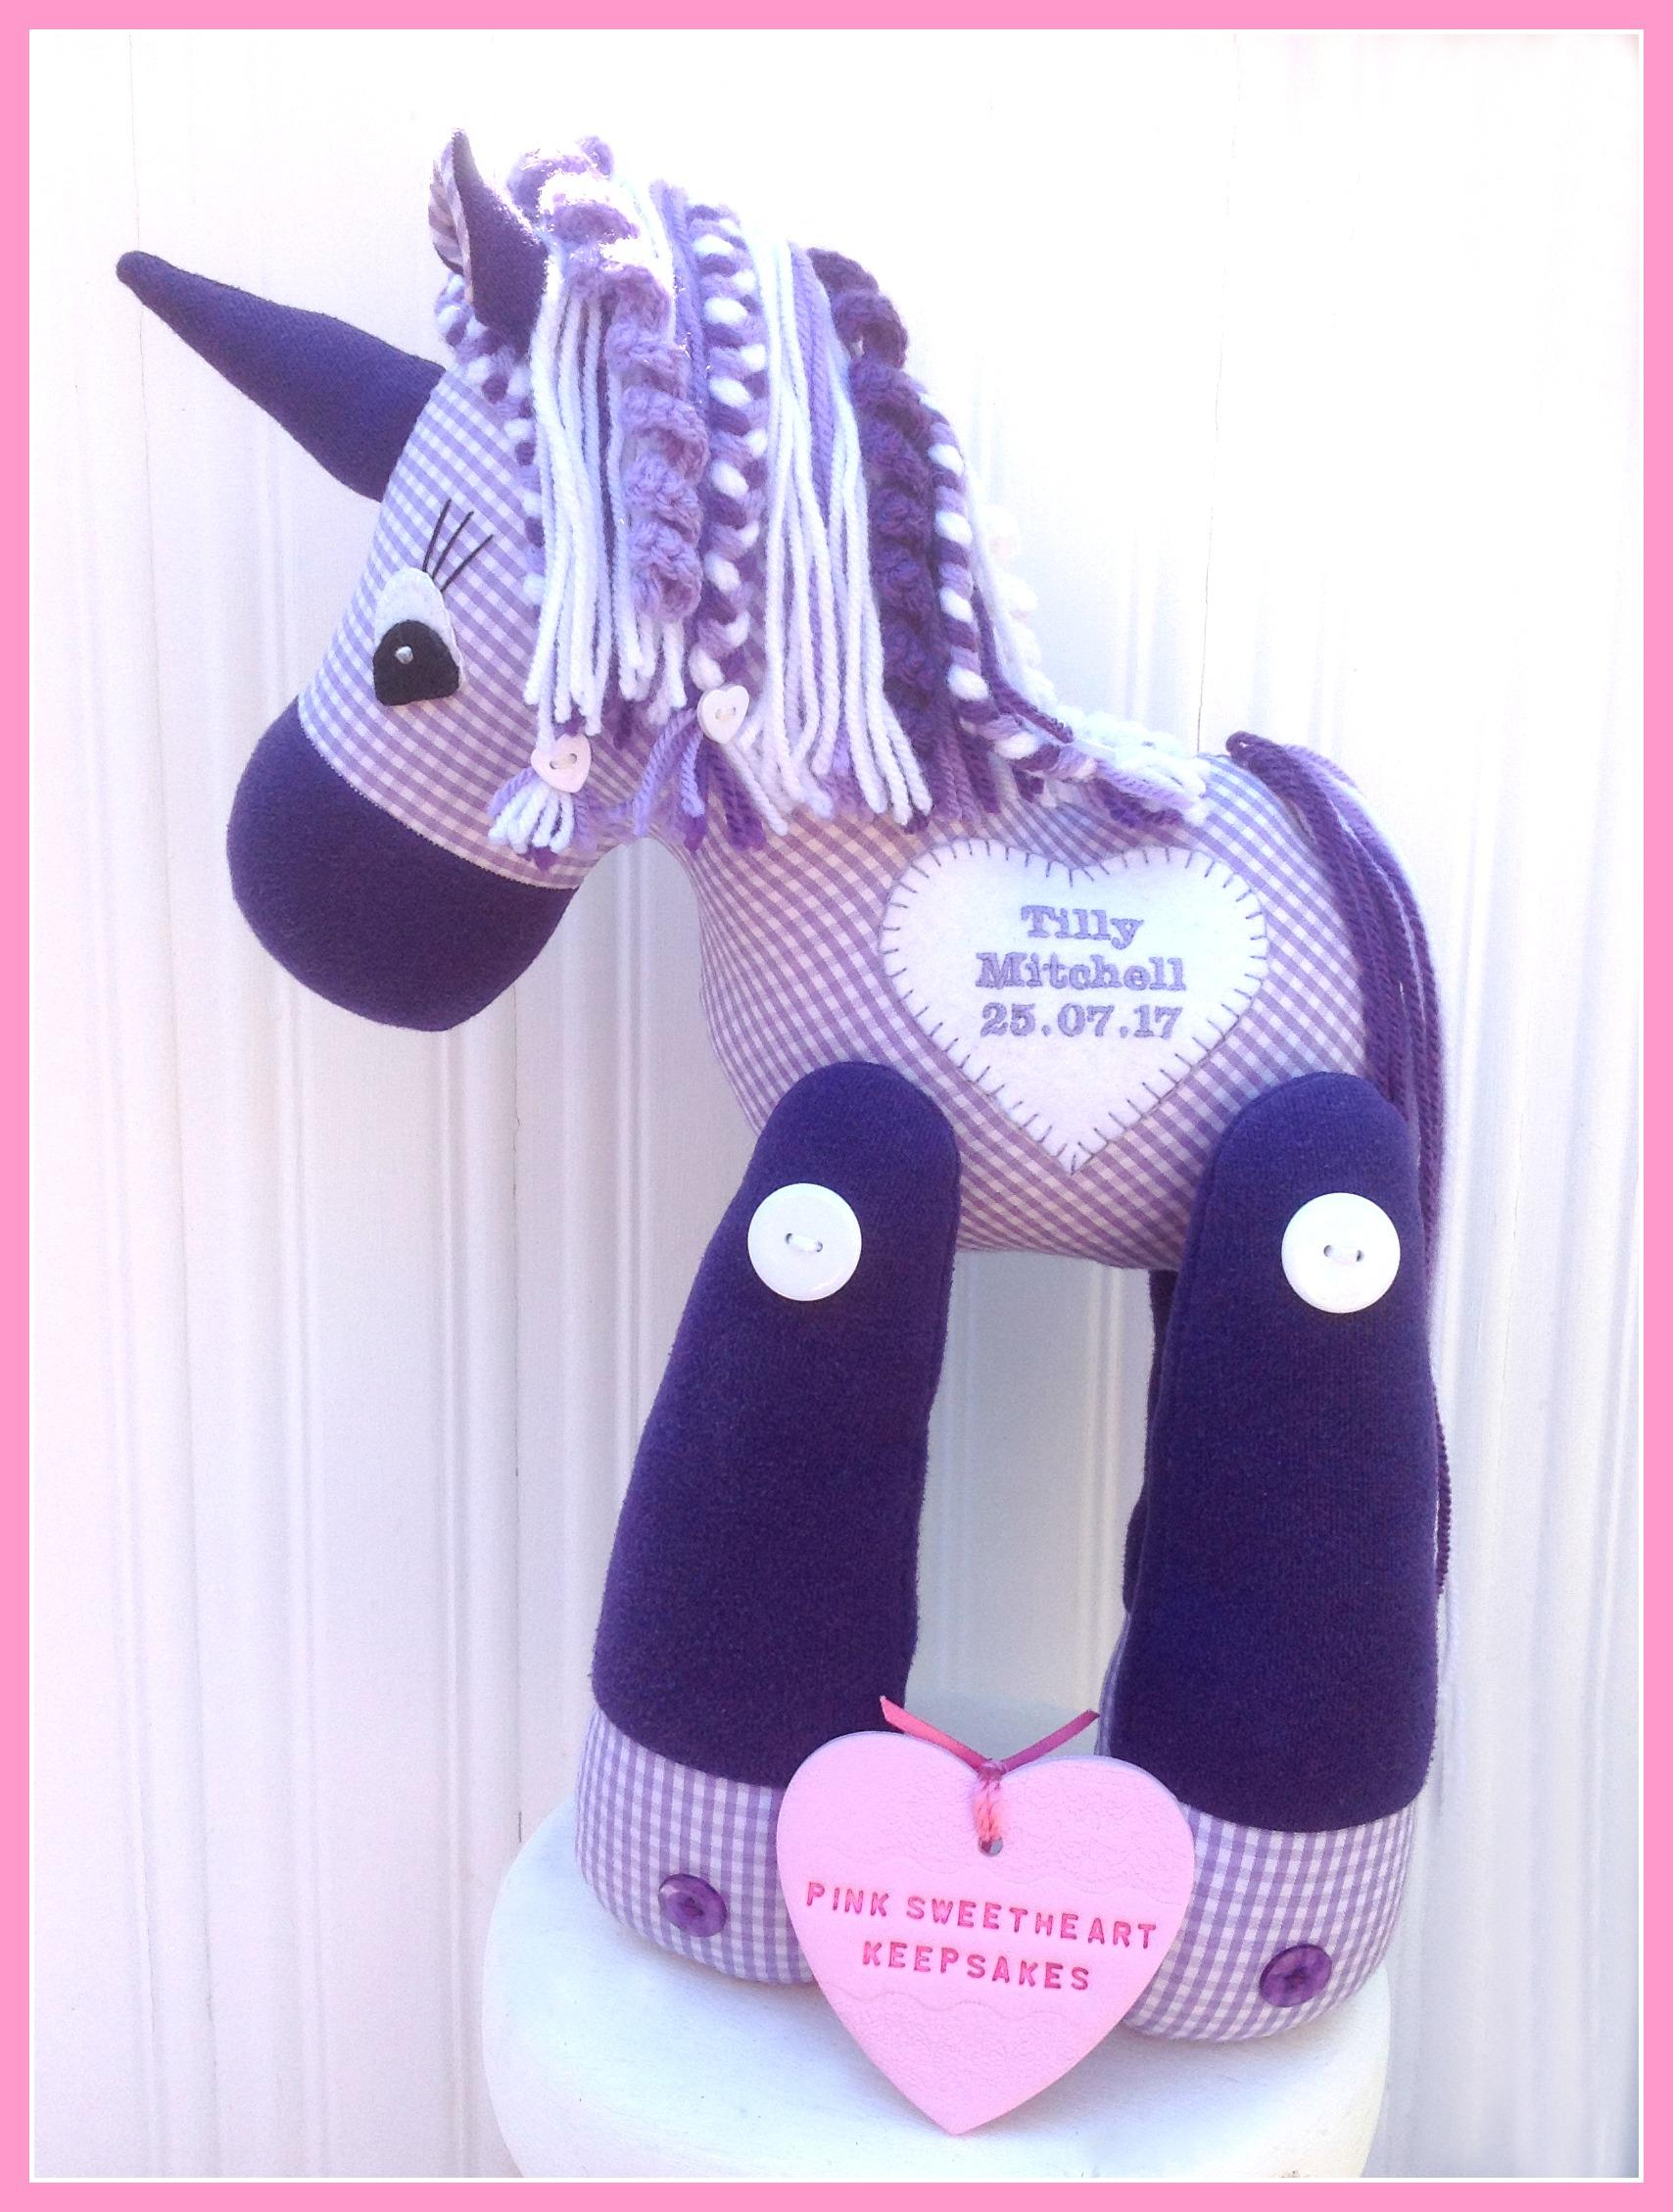 Tilly's School Uniform Unicorn